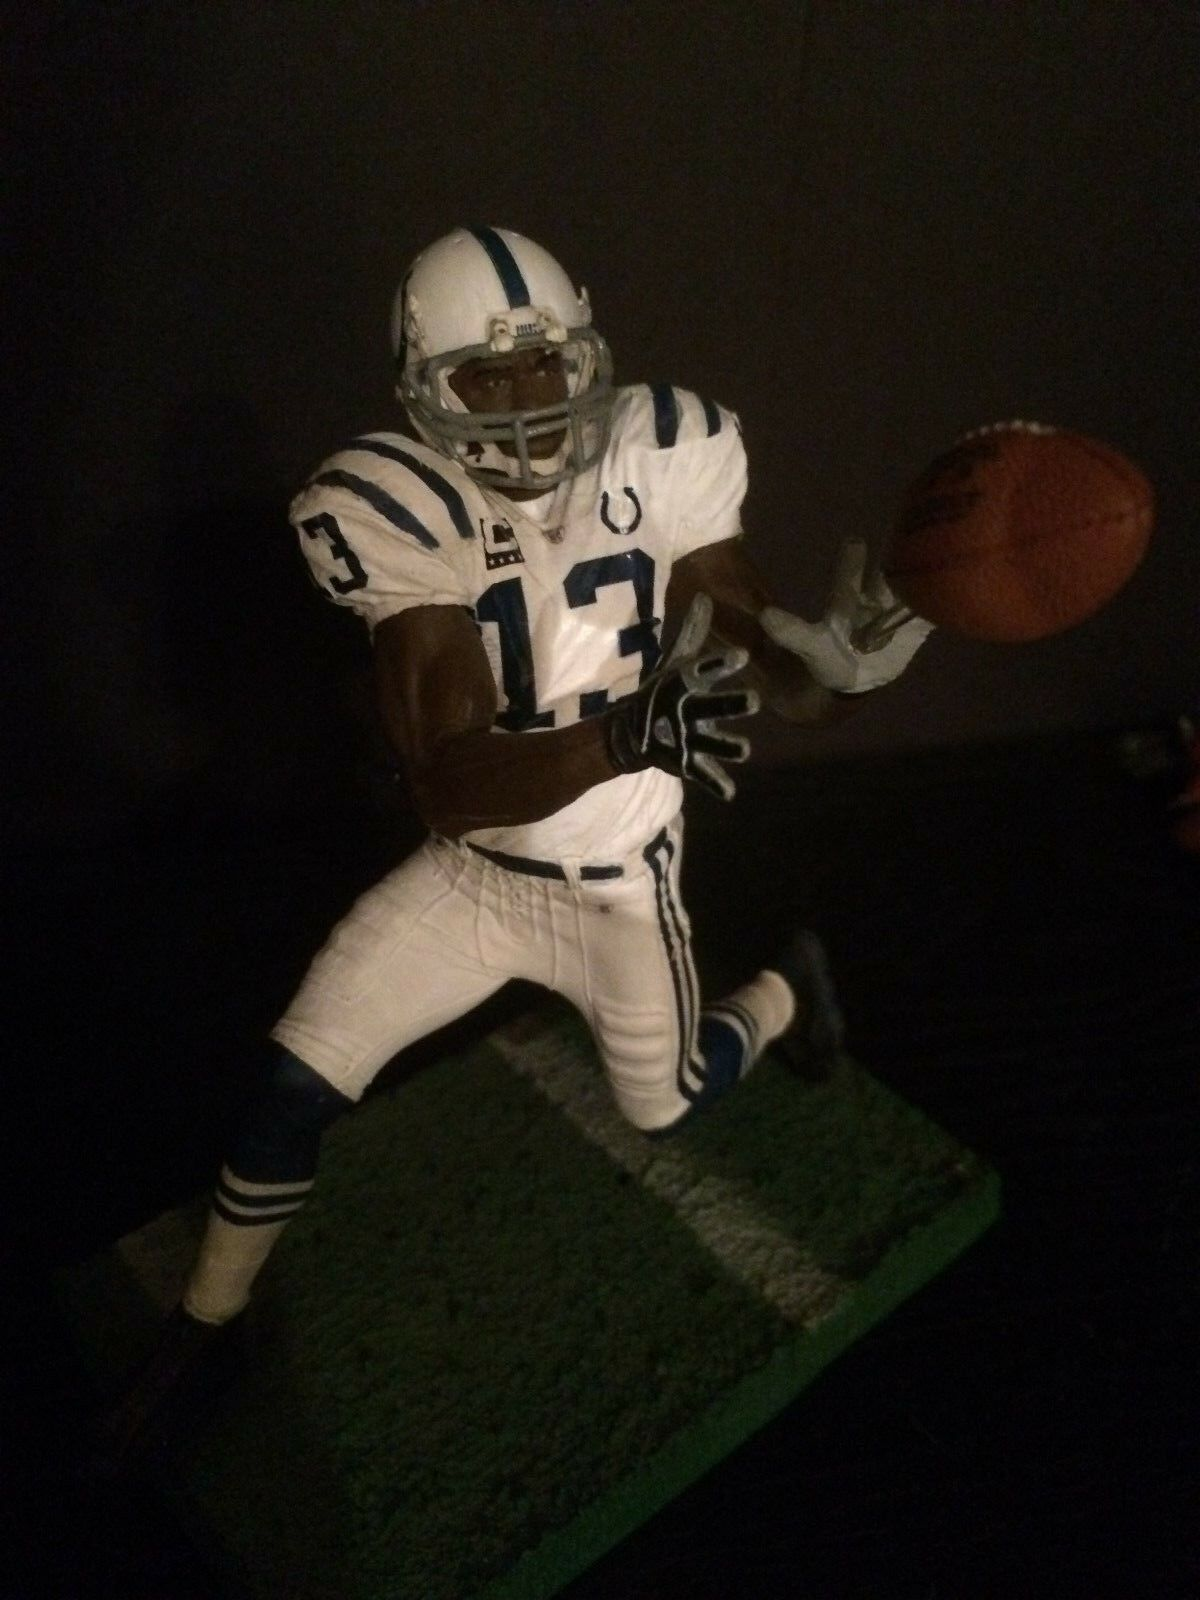 TY Hilton Indianapolis Colts Jersey Custom 6  Mcfarlane Figure